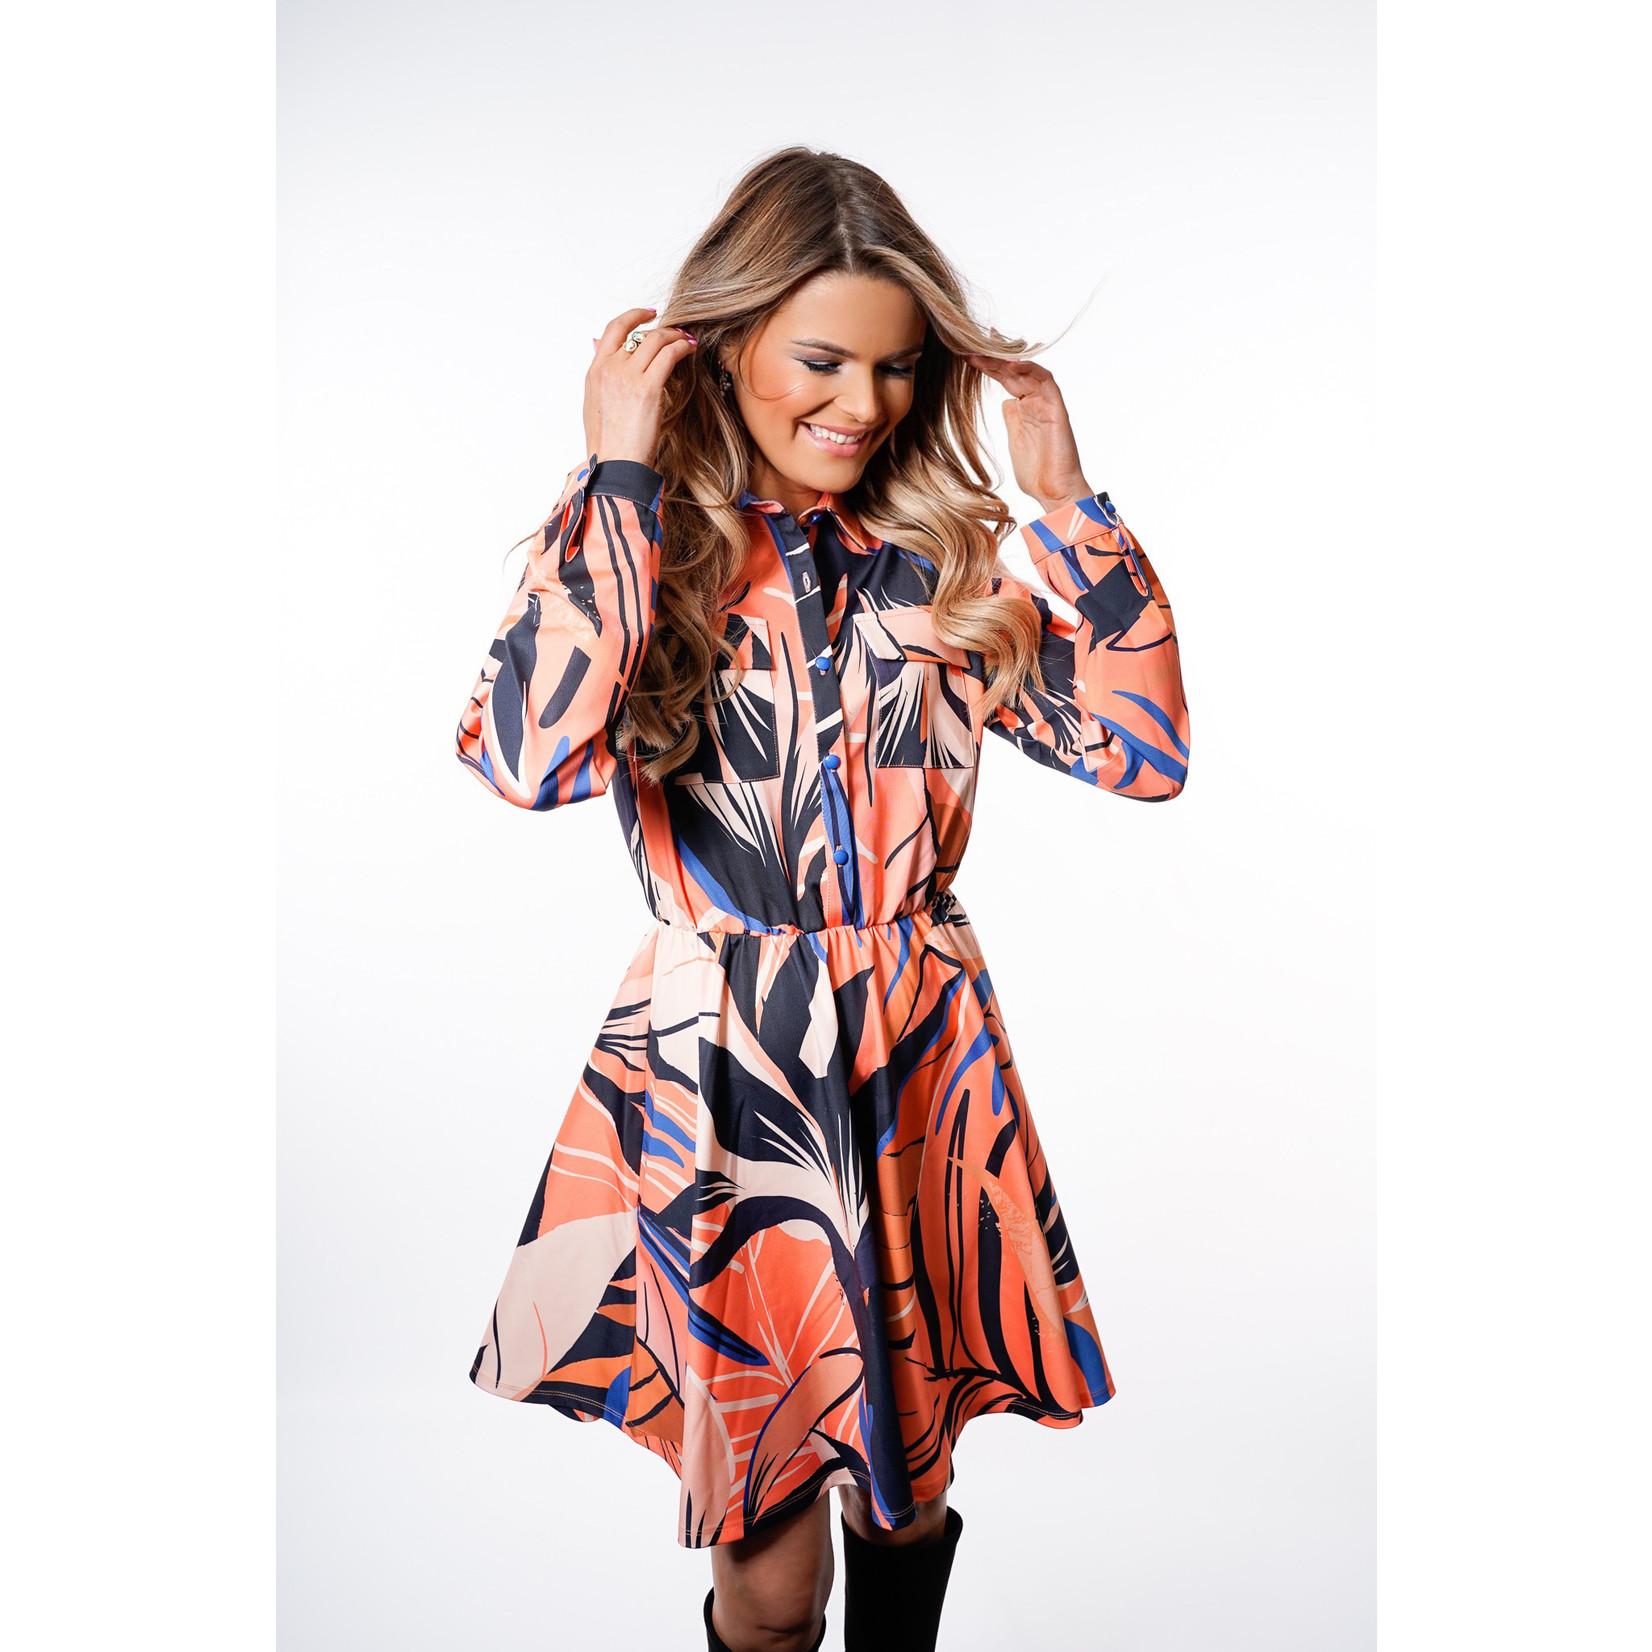 Yentl K Sweet Dress 19-3